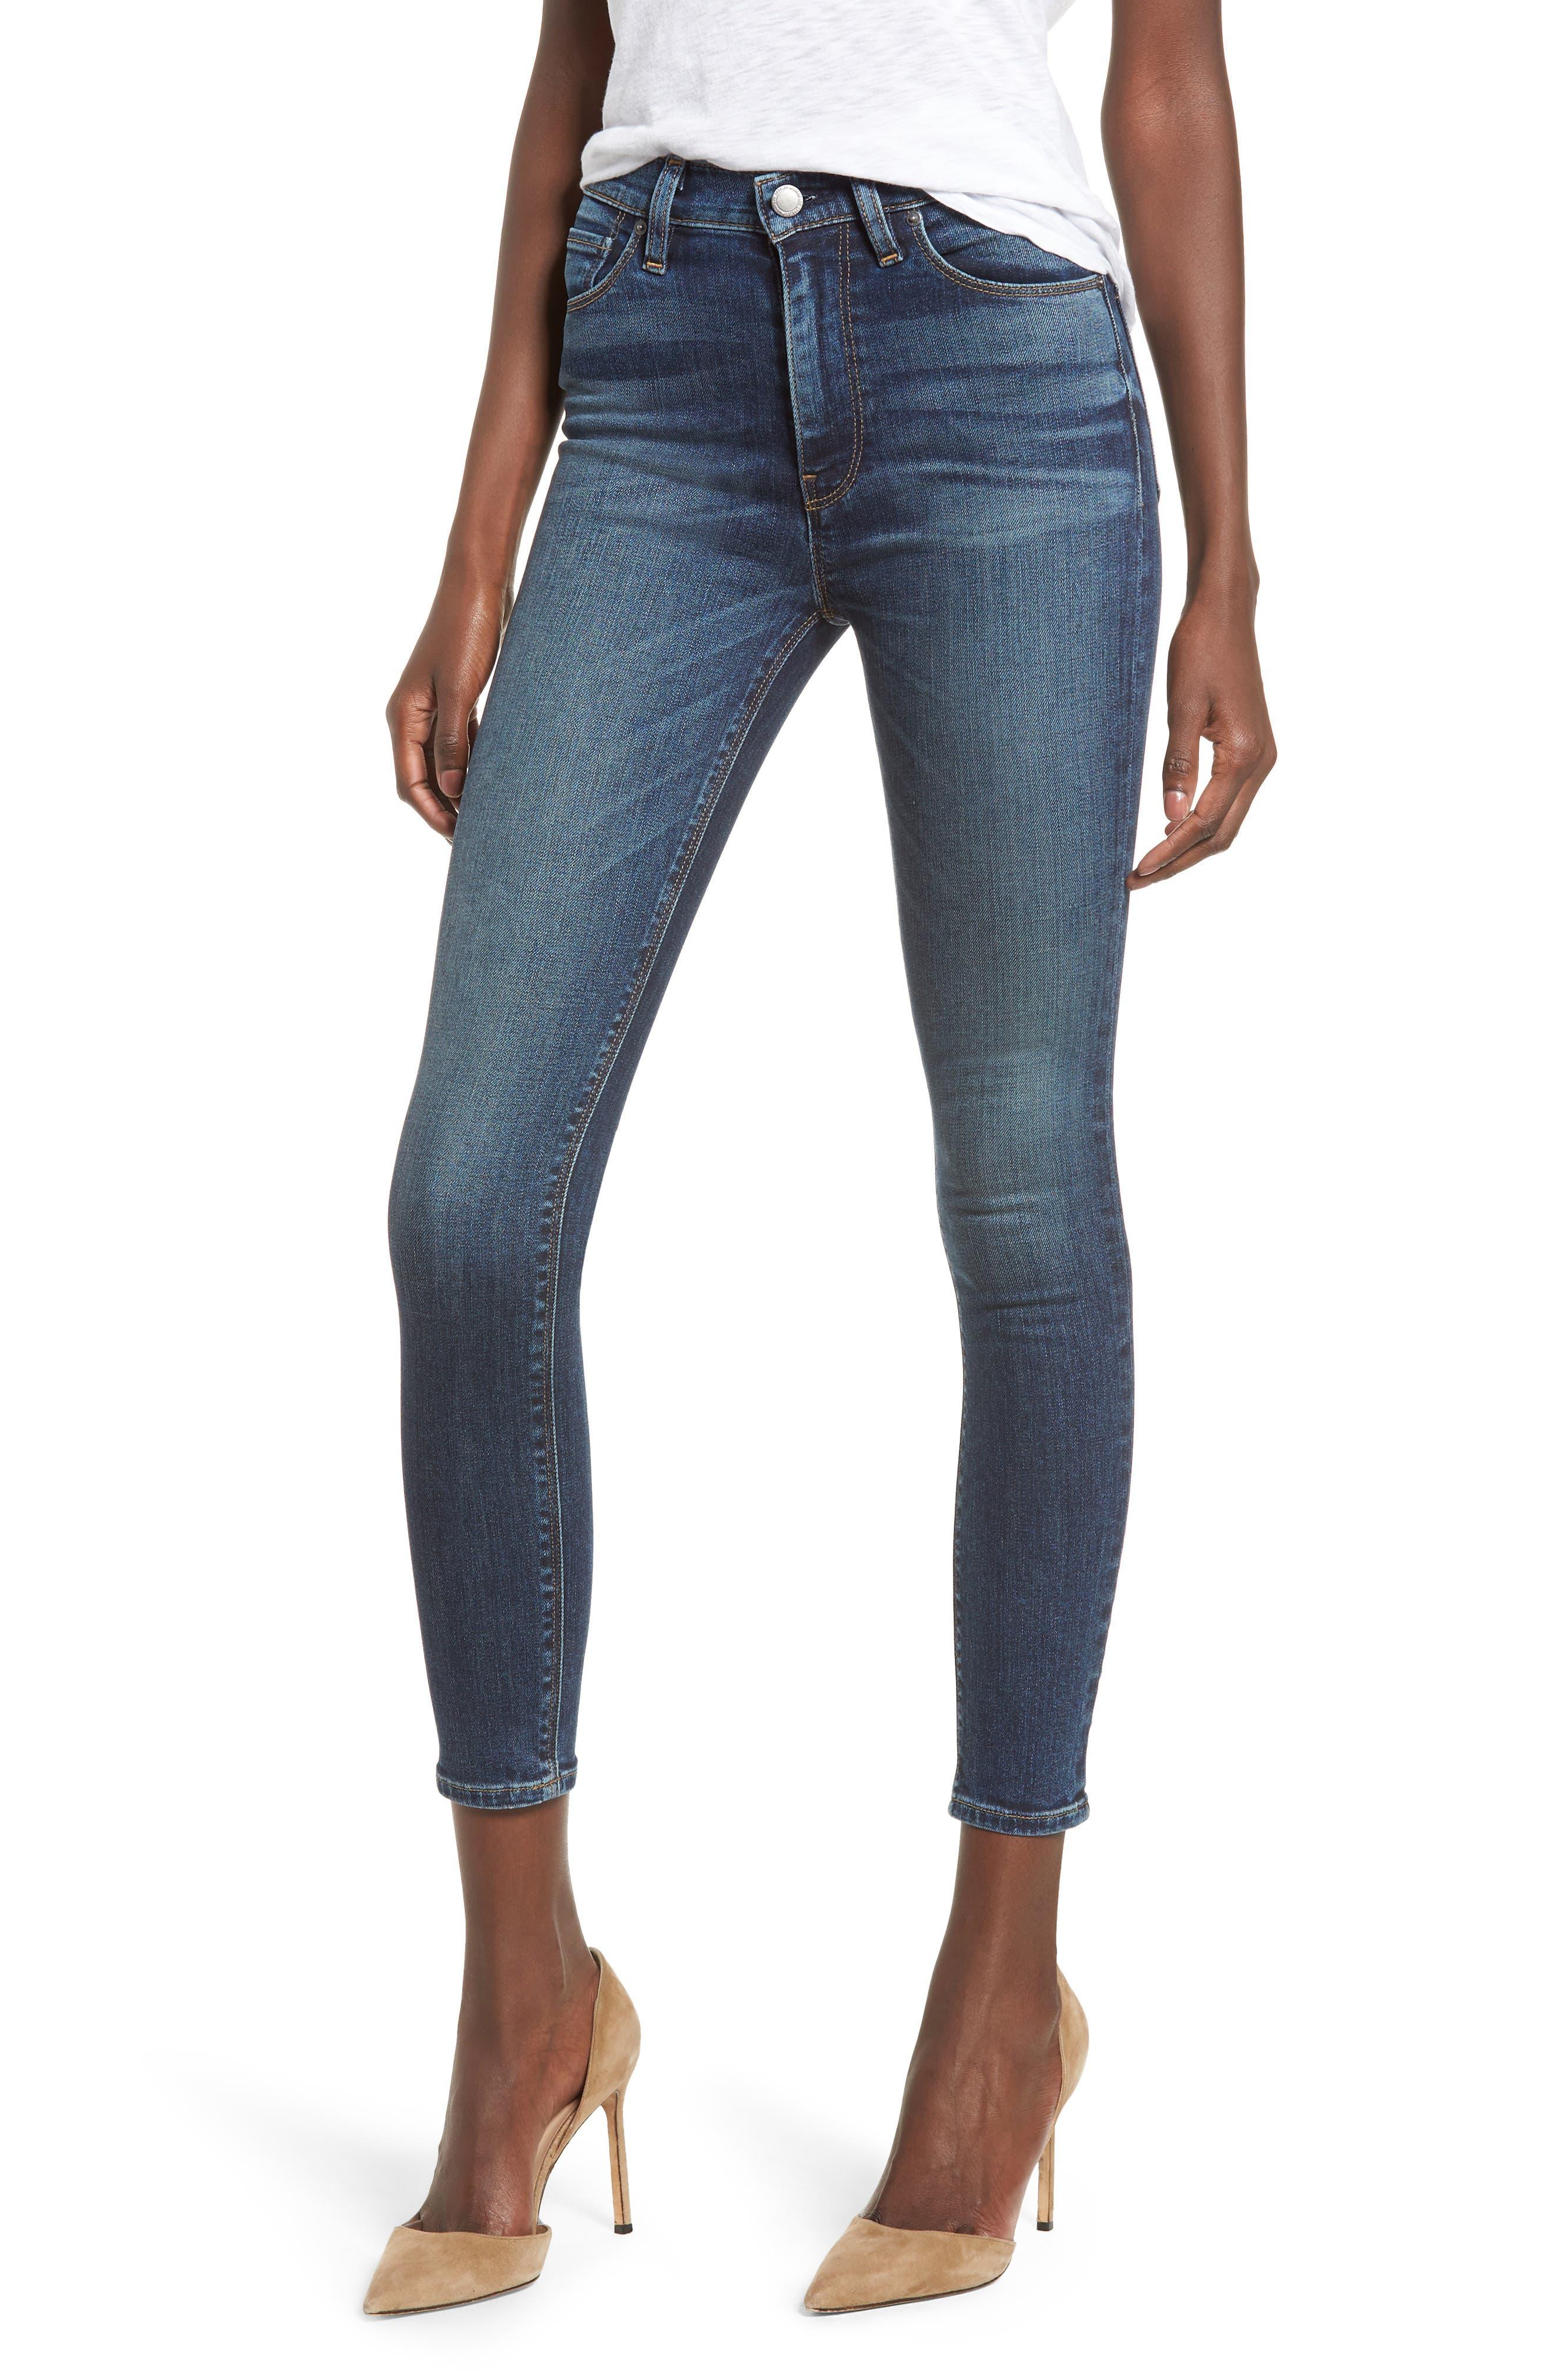 Barbara High Waist Ankle Skinny Jeans,                             Main thumbnail 1, color,                             CLEAN SIDE BAR